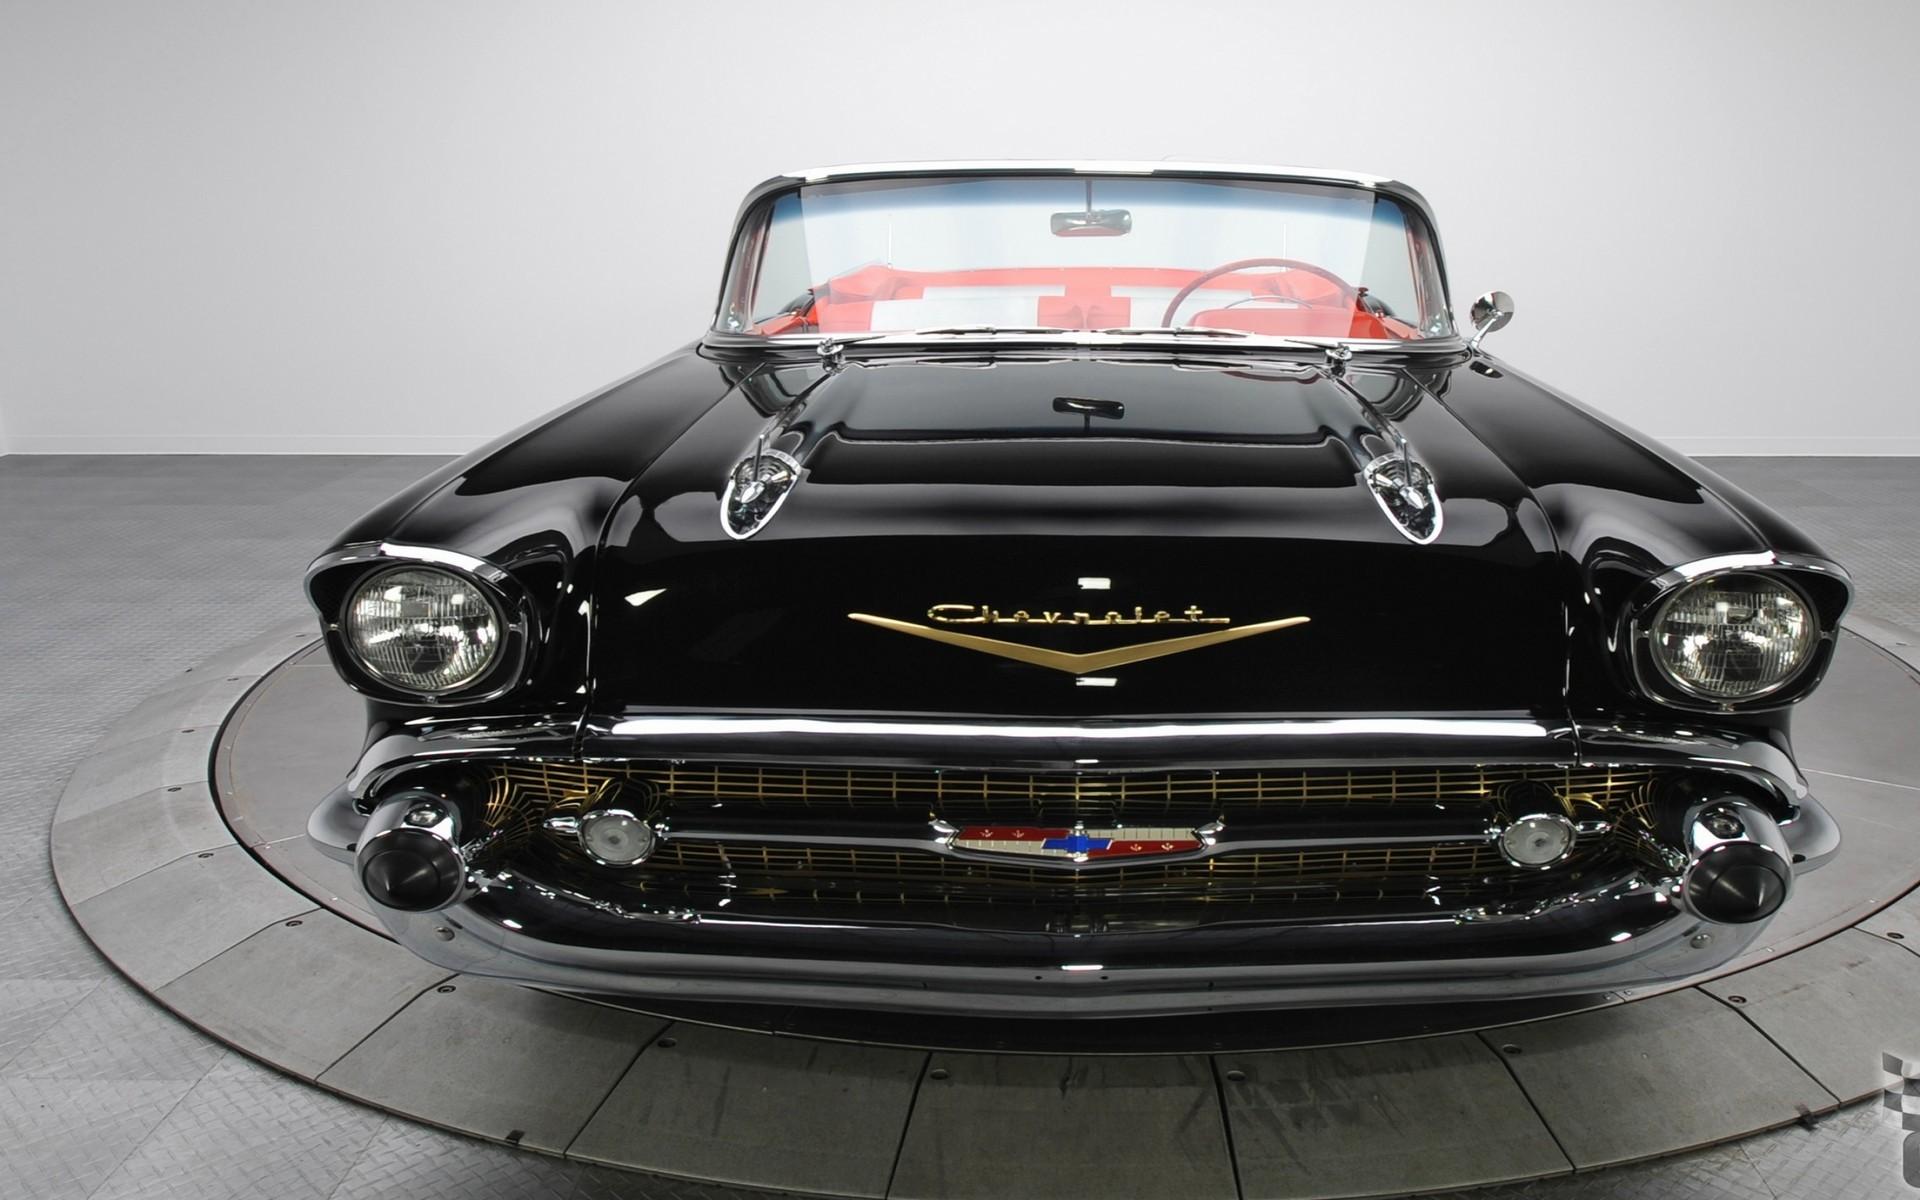 Wallpaper Vintage Black Cars Coupe Convertible Oldtimer 1966 Chevrolet Bel Air Conv Impala Sedan Land Vehicle Automotive Design Exterior